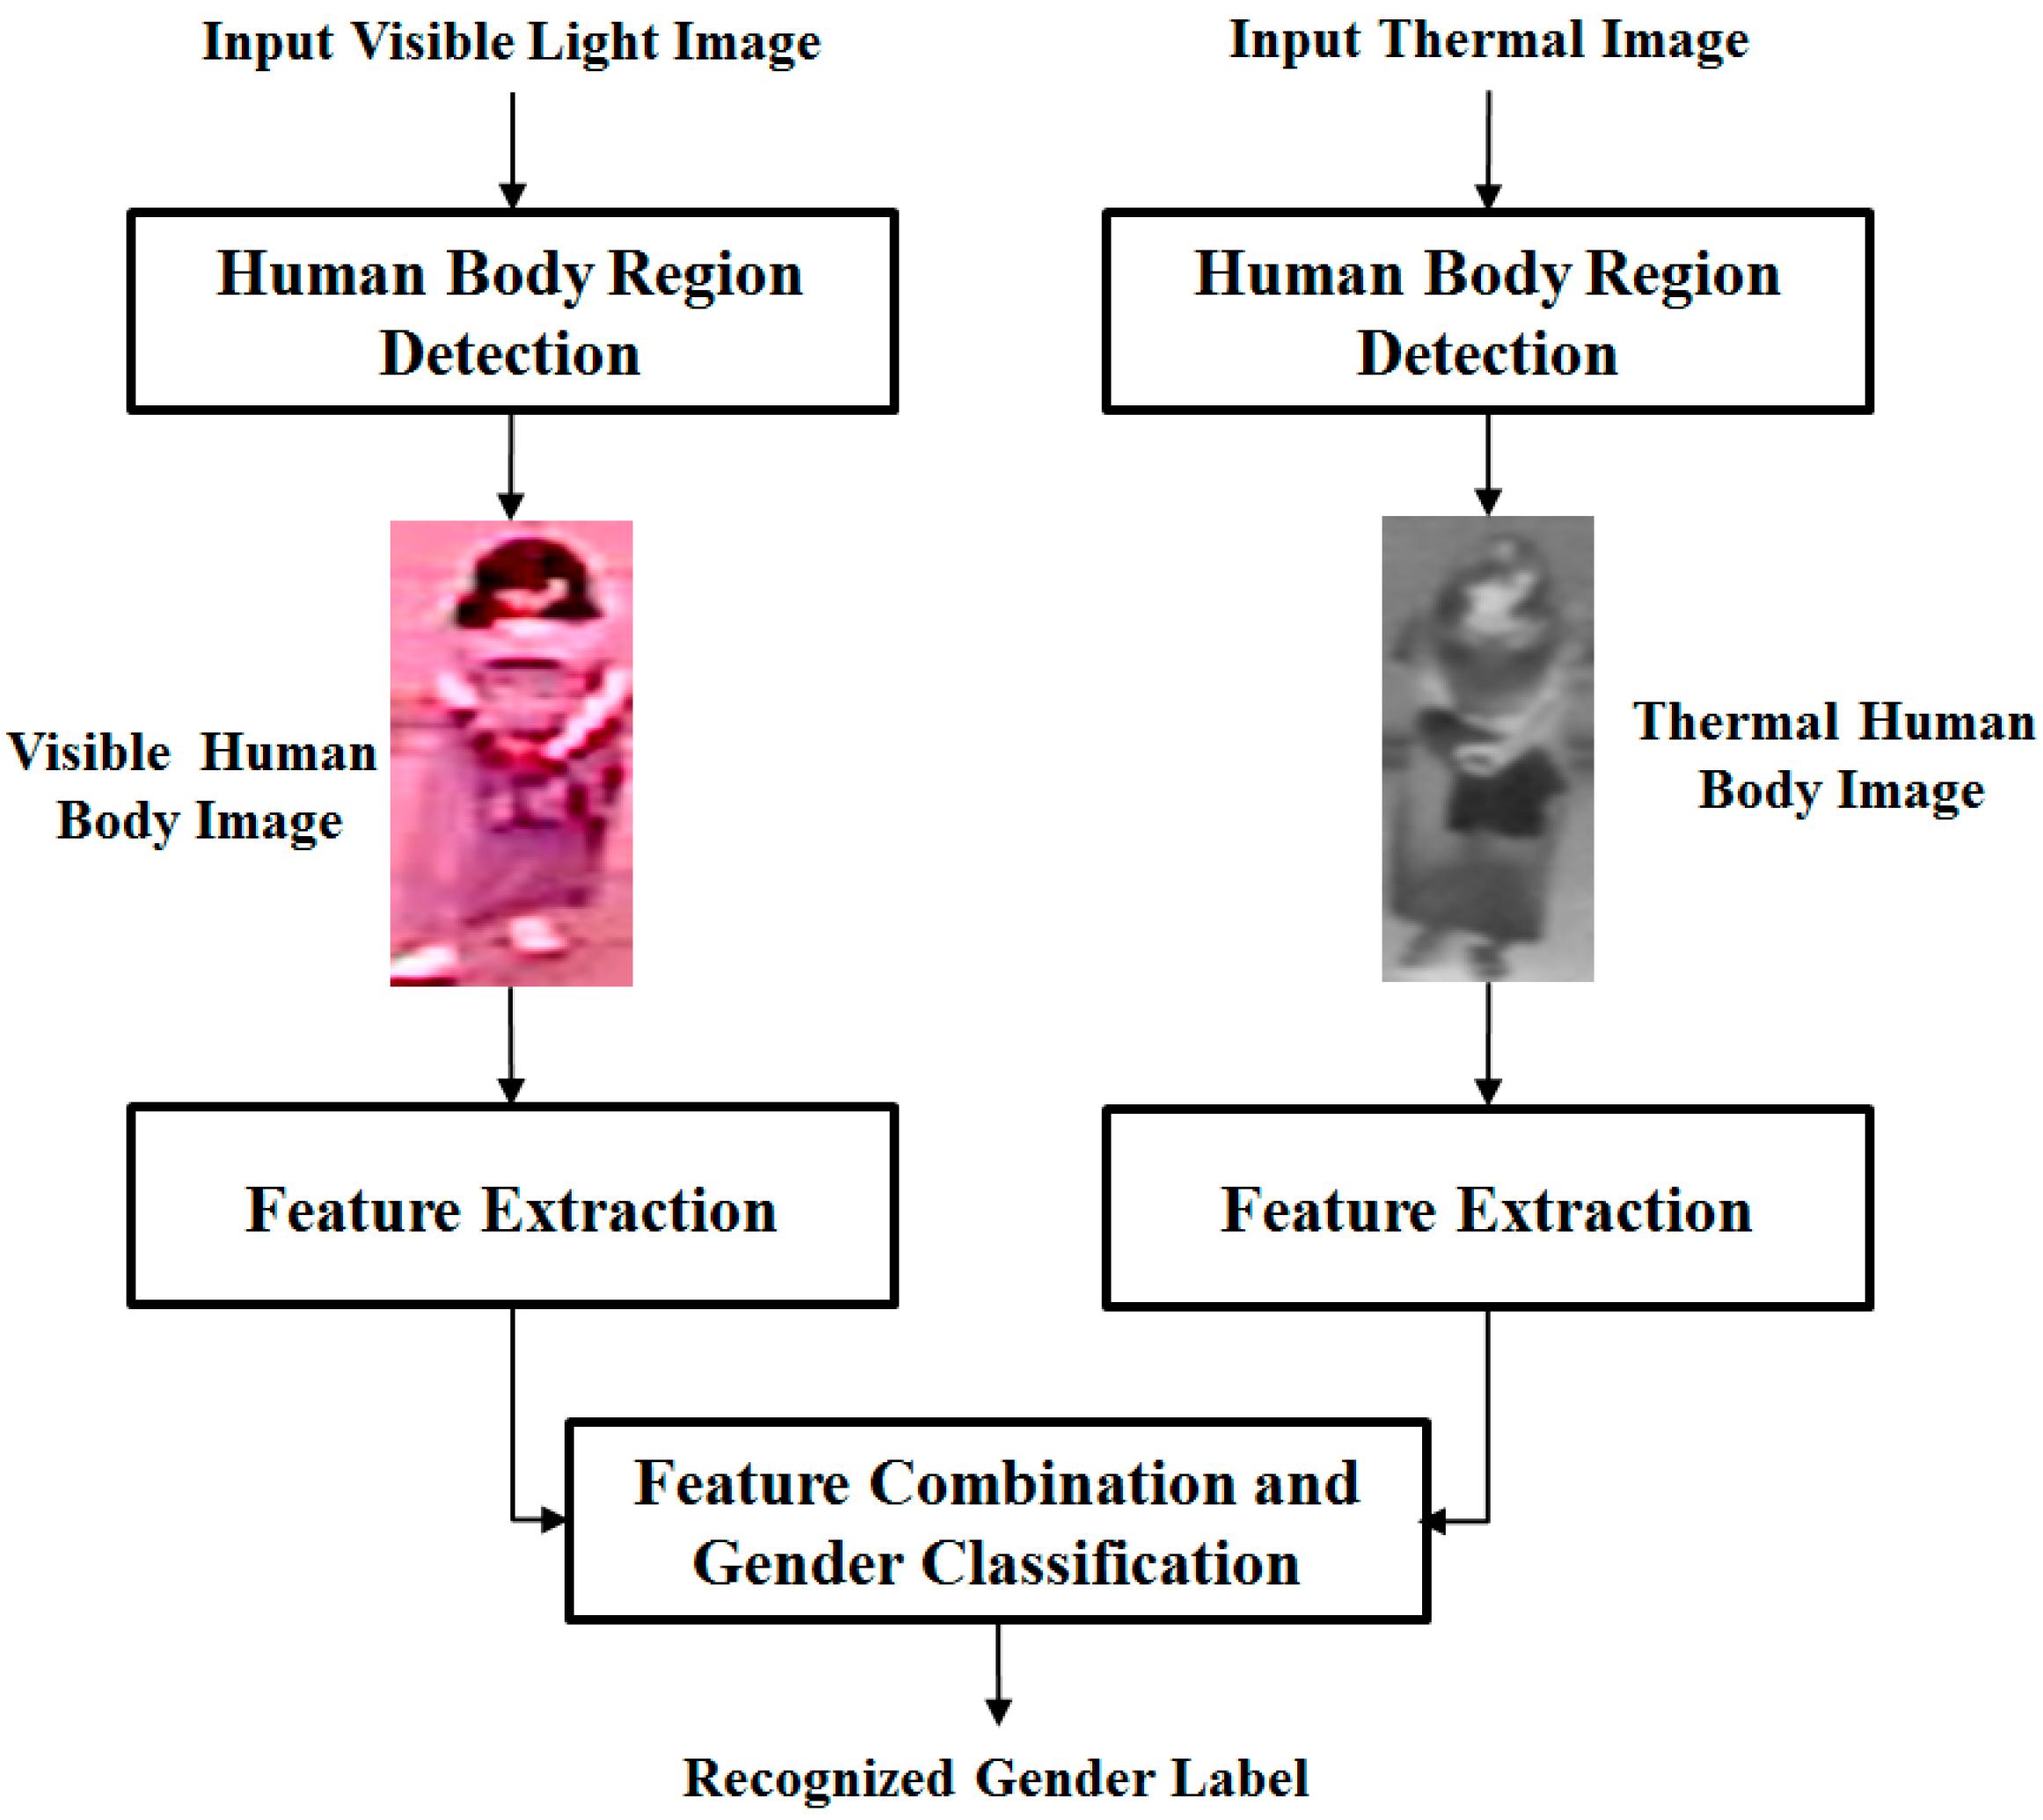 Sensors | Free Full-Text | Body-Based Gender Recognition Using